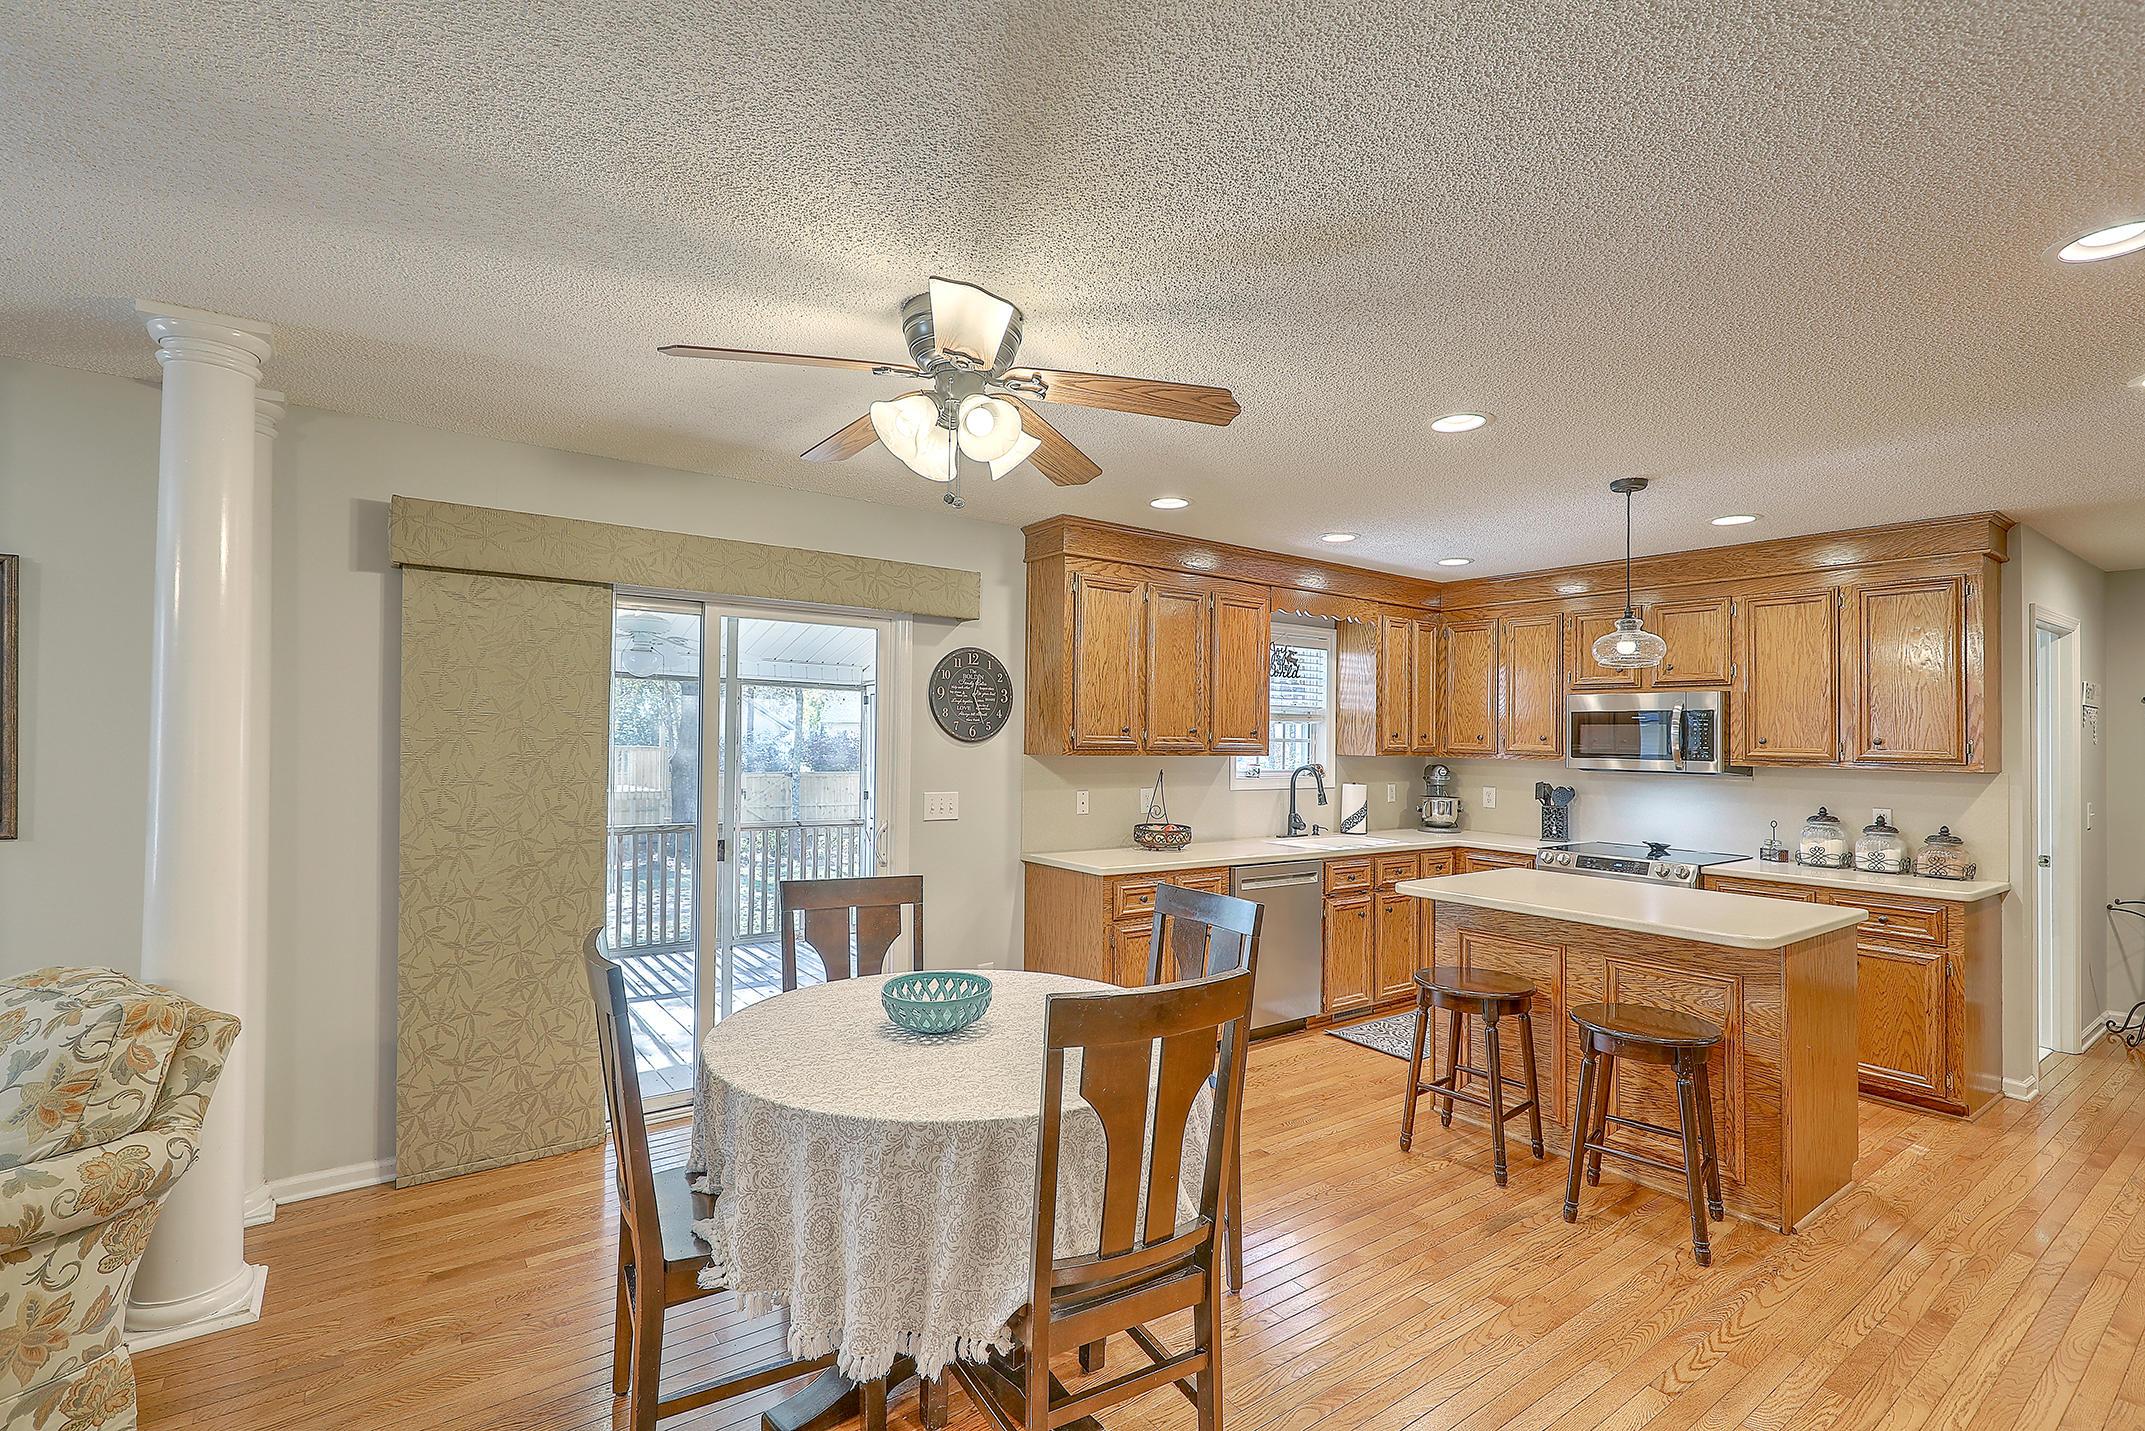 Crowfield Plantation Homes For Sale - 104 Jamesford, Goose Creek, SC - 4